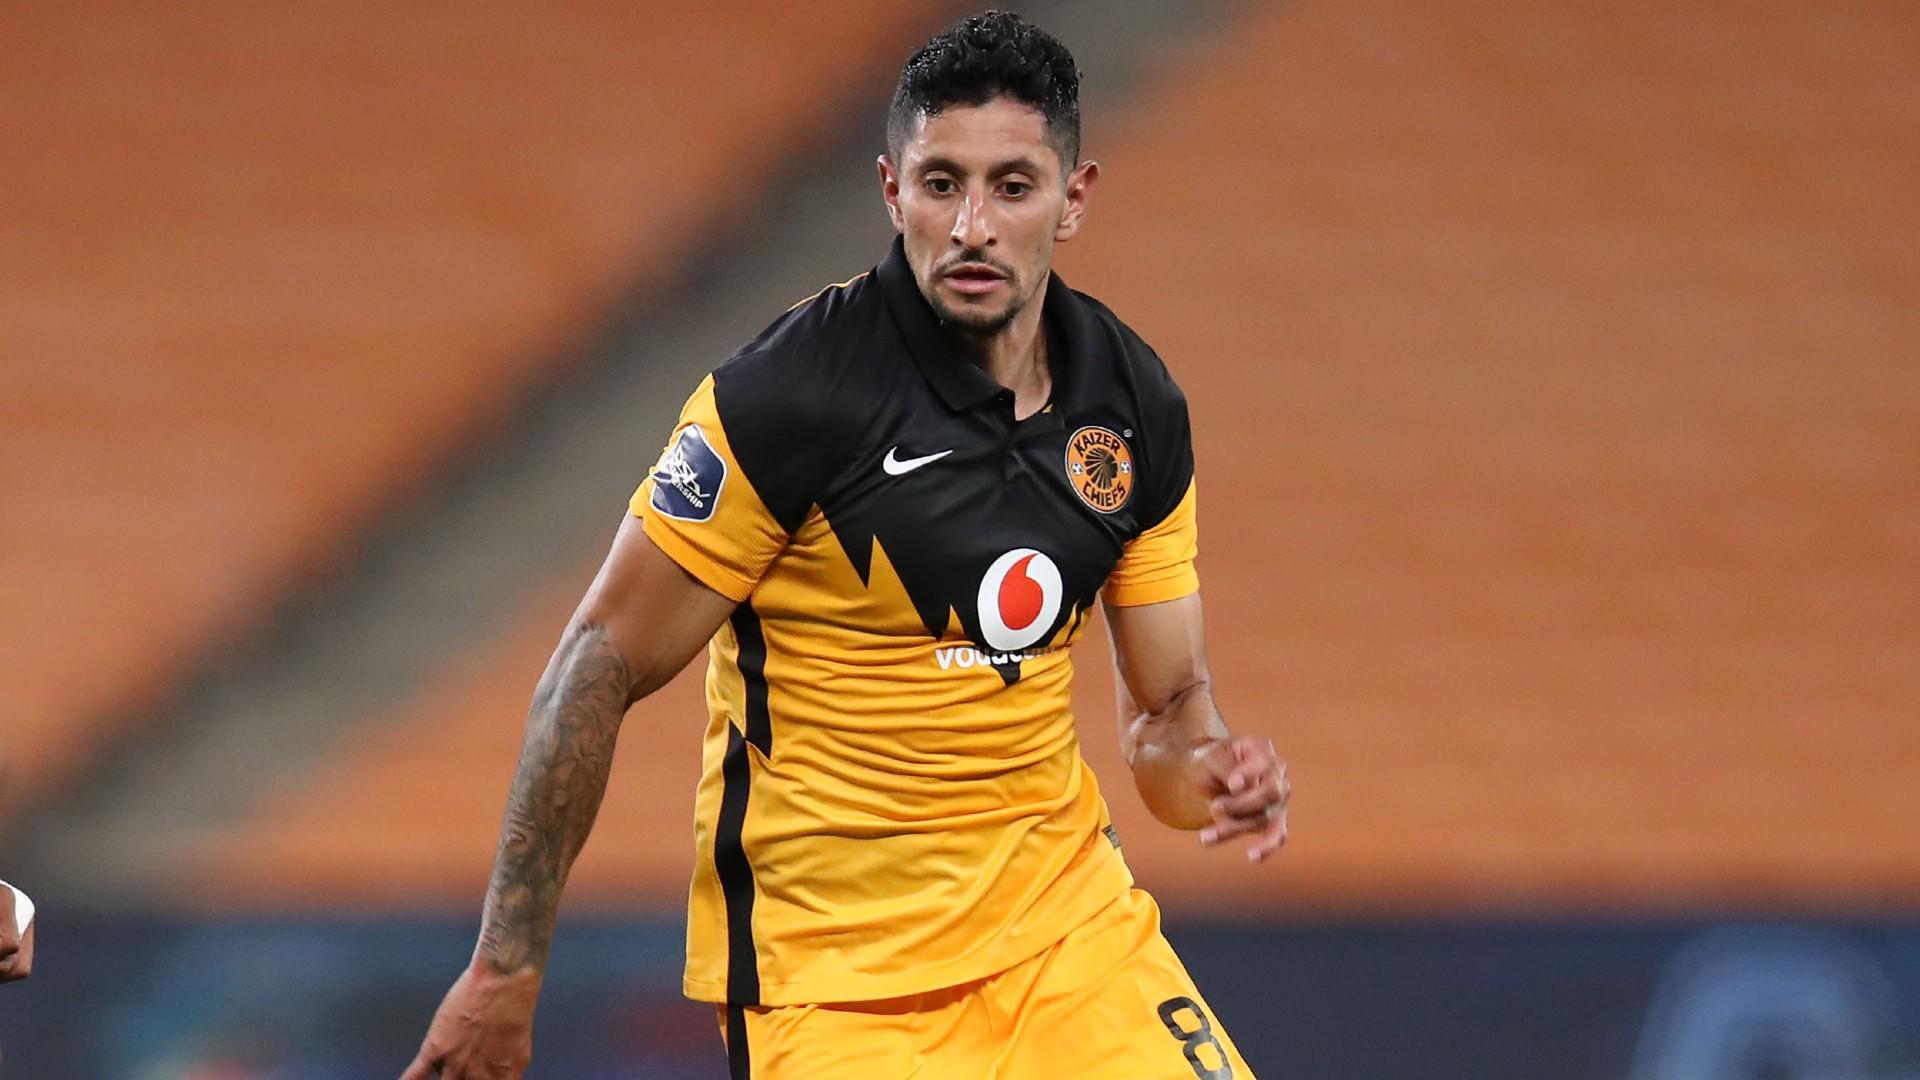 Leonardo Castro: Kaizer Chiefs striker out for 16 weeks - Stuart Baxter